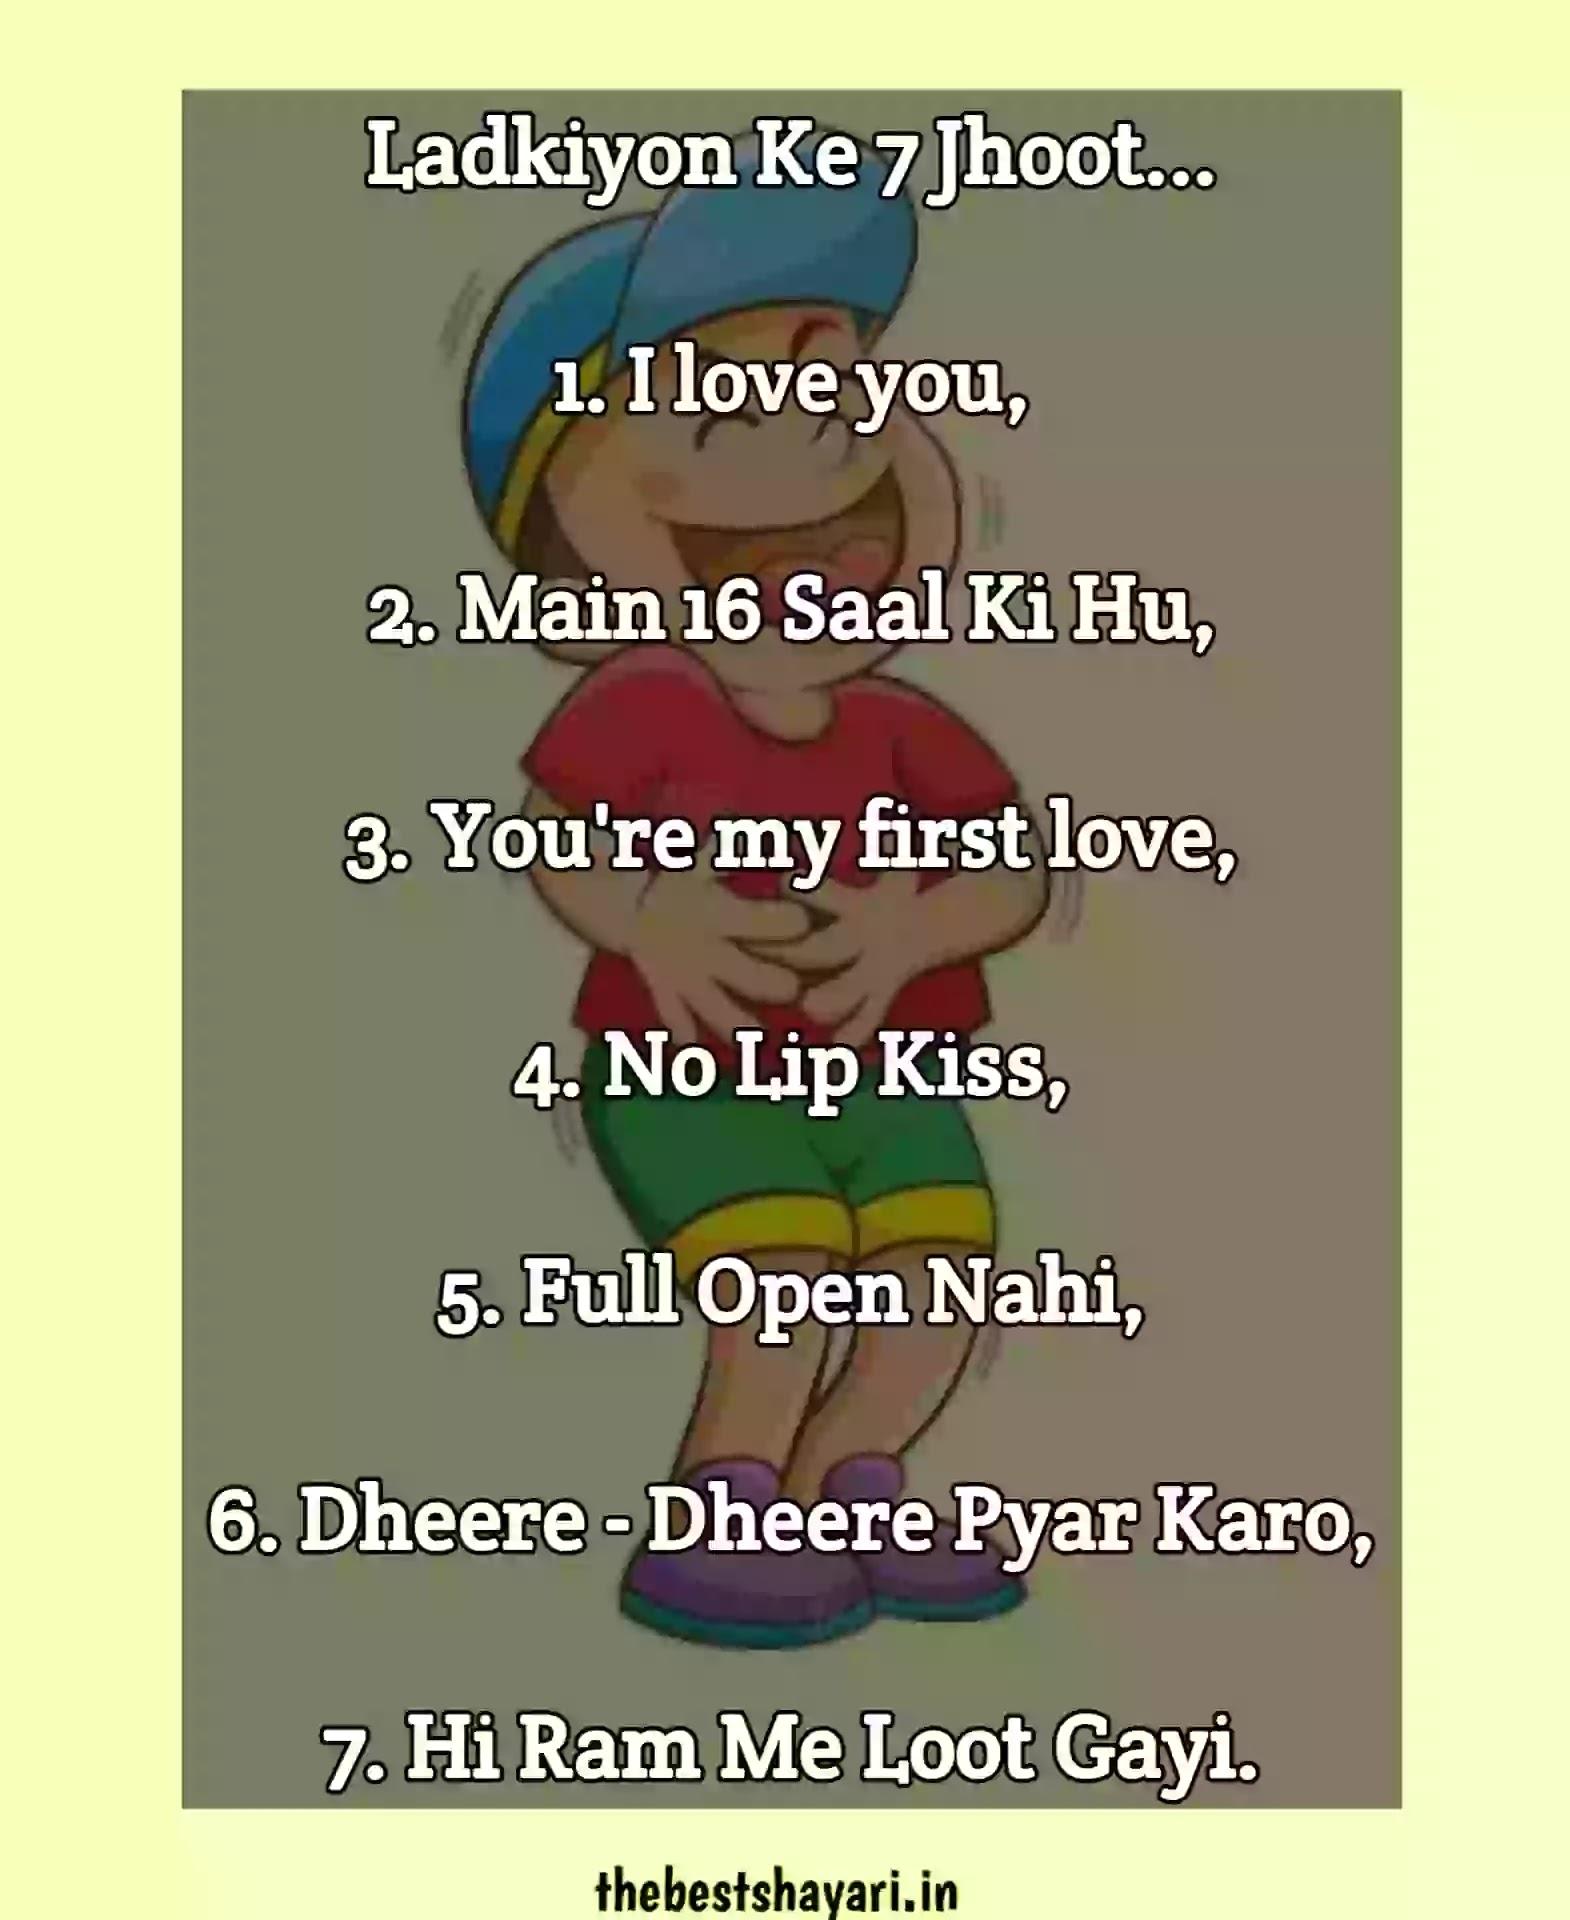 best jokes in the world in Hindi